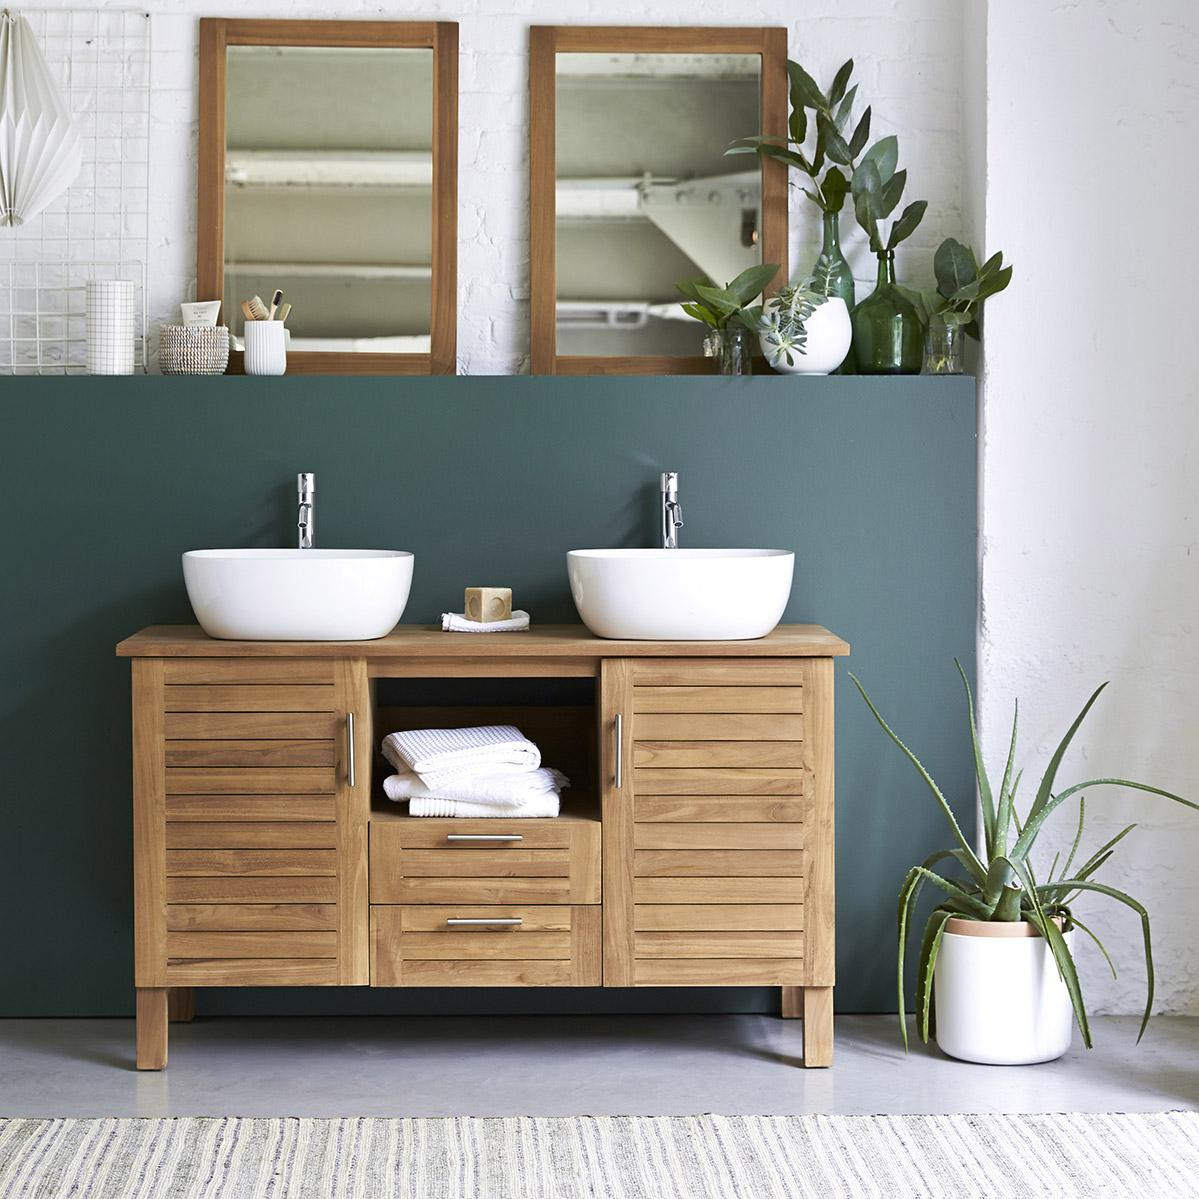 Meuble double vasque l.16 x H.16 x P.16 cm, teck, Soho